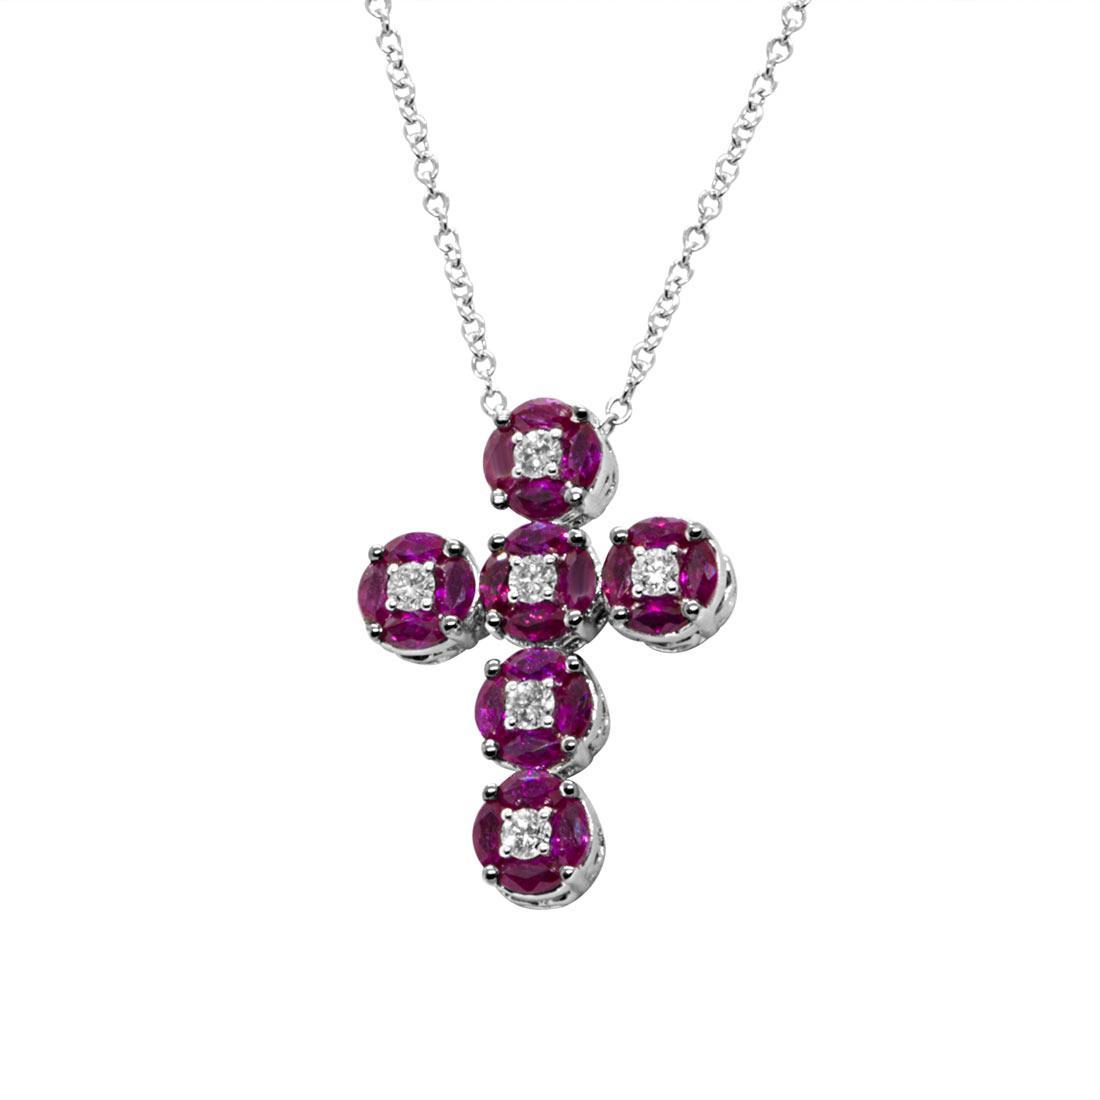 Collana in oro bianco a croce in diamanti e rubini - ALFIERI & ST. JOHN